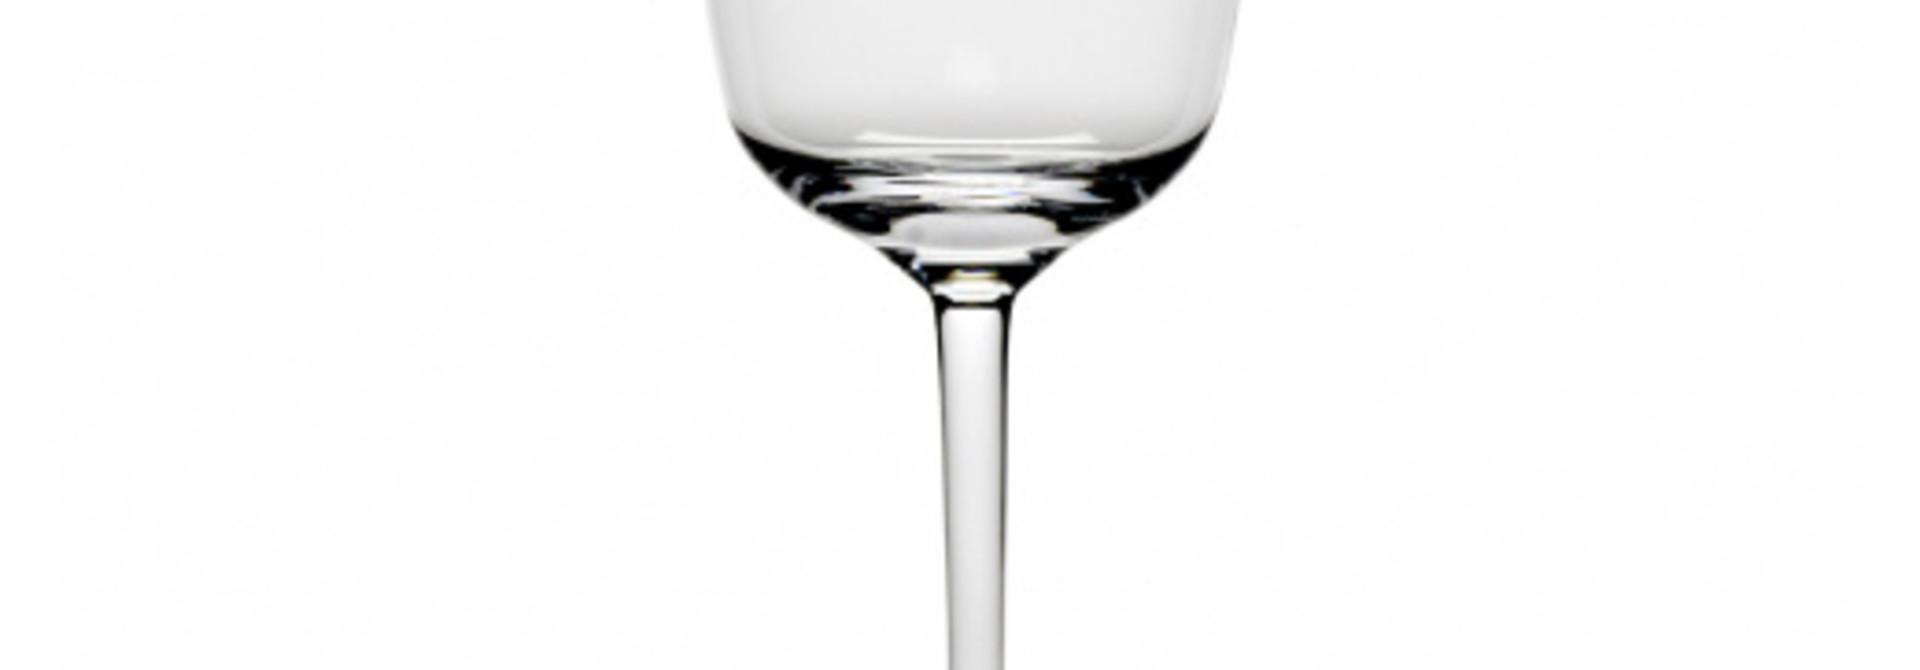 Glass B0819706 - White Wine